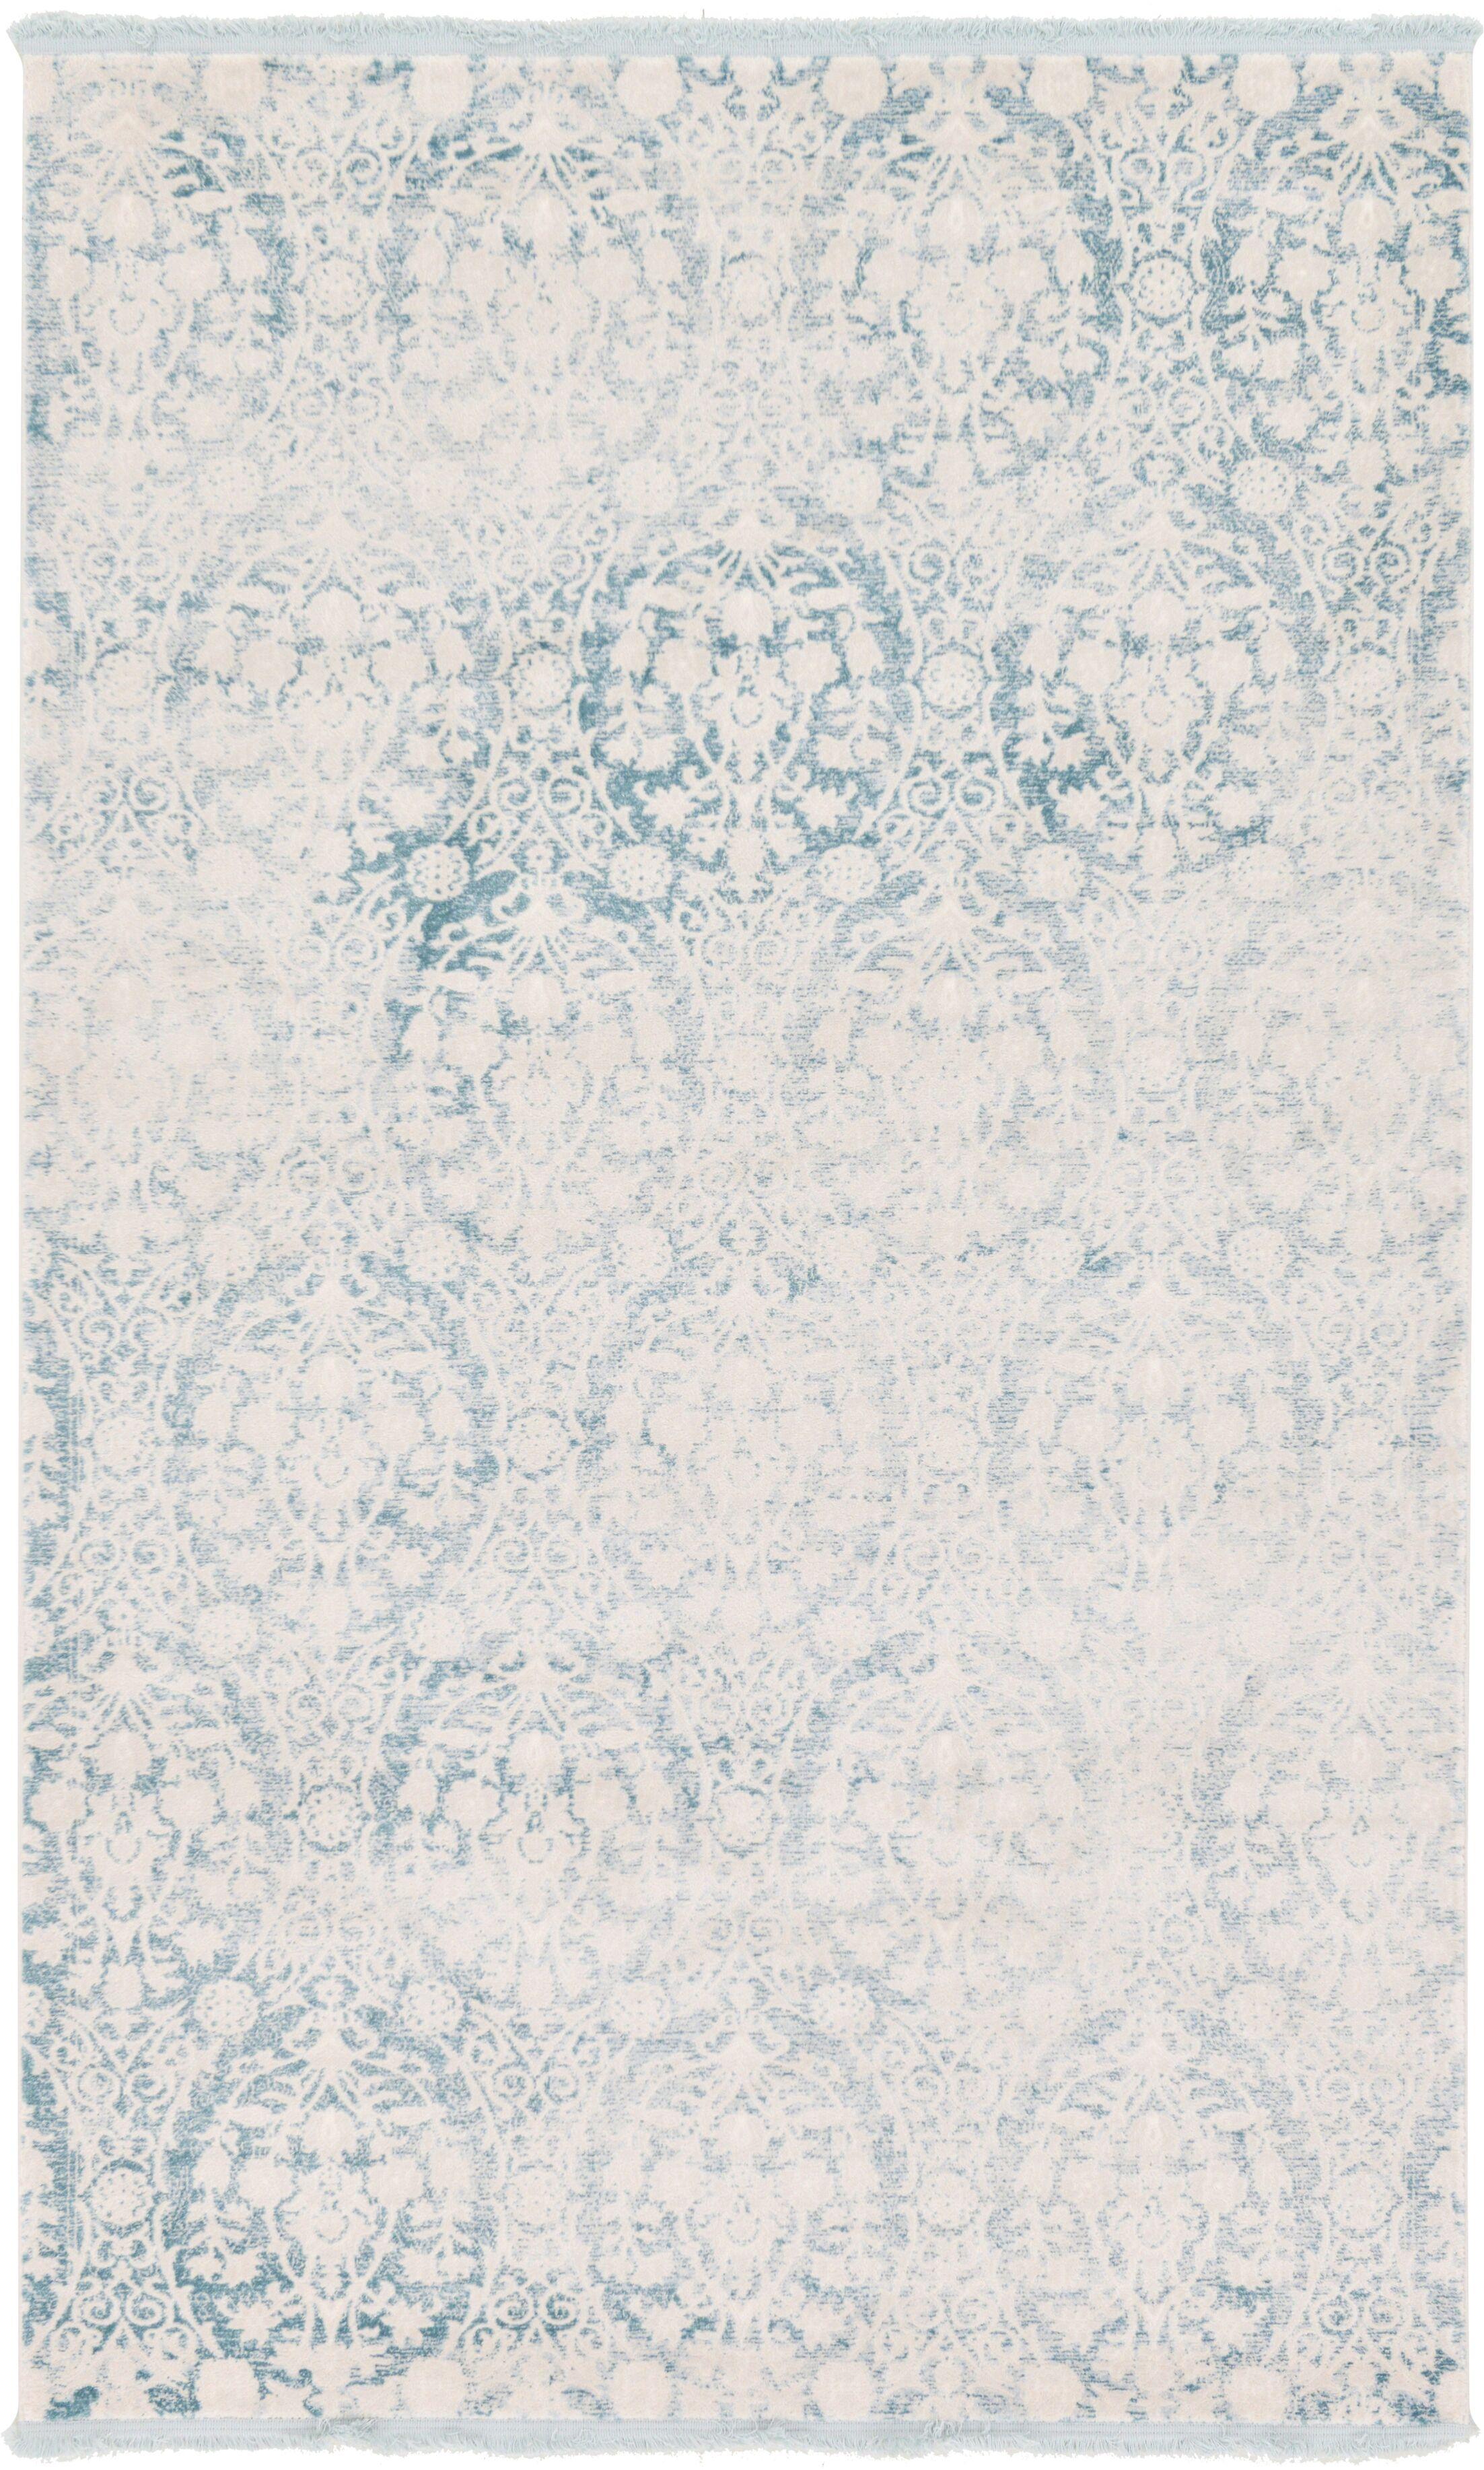 Patenaude Light Blue Area Rug Rug Size: Rectangle 5' x 8'